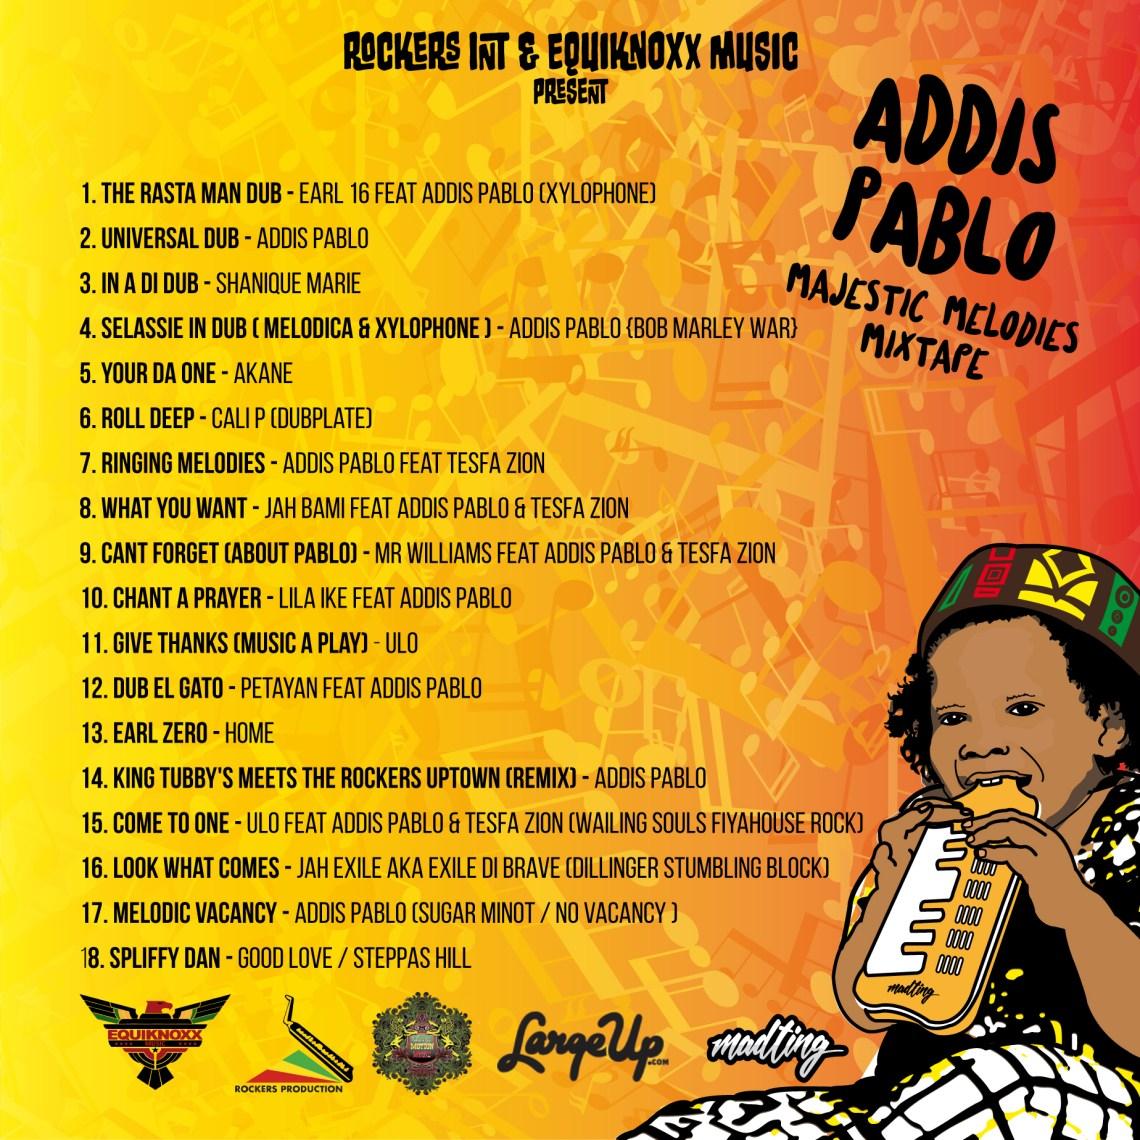 Addis-Pablo-Majestic-Melodies-mixtape-back-cover